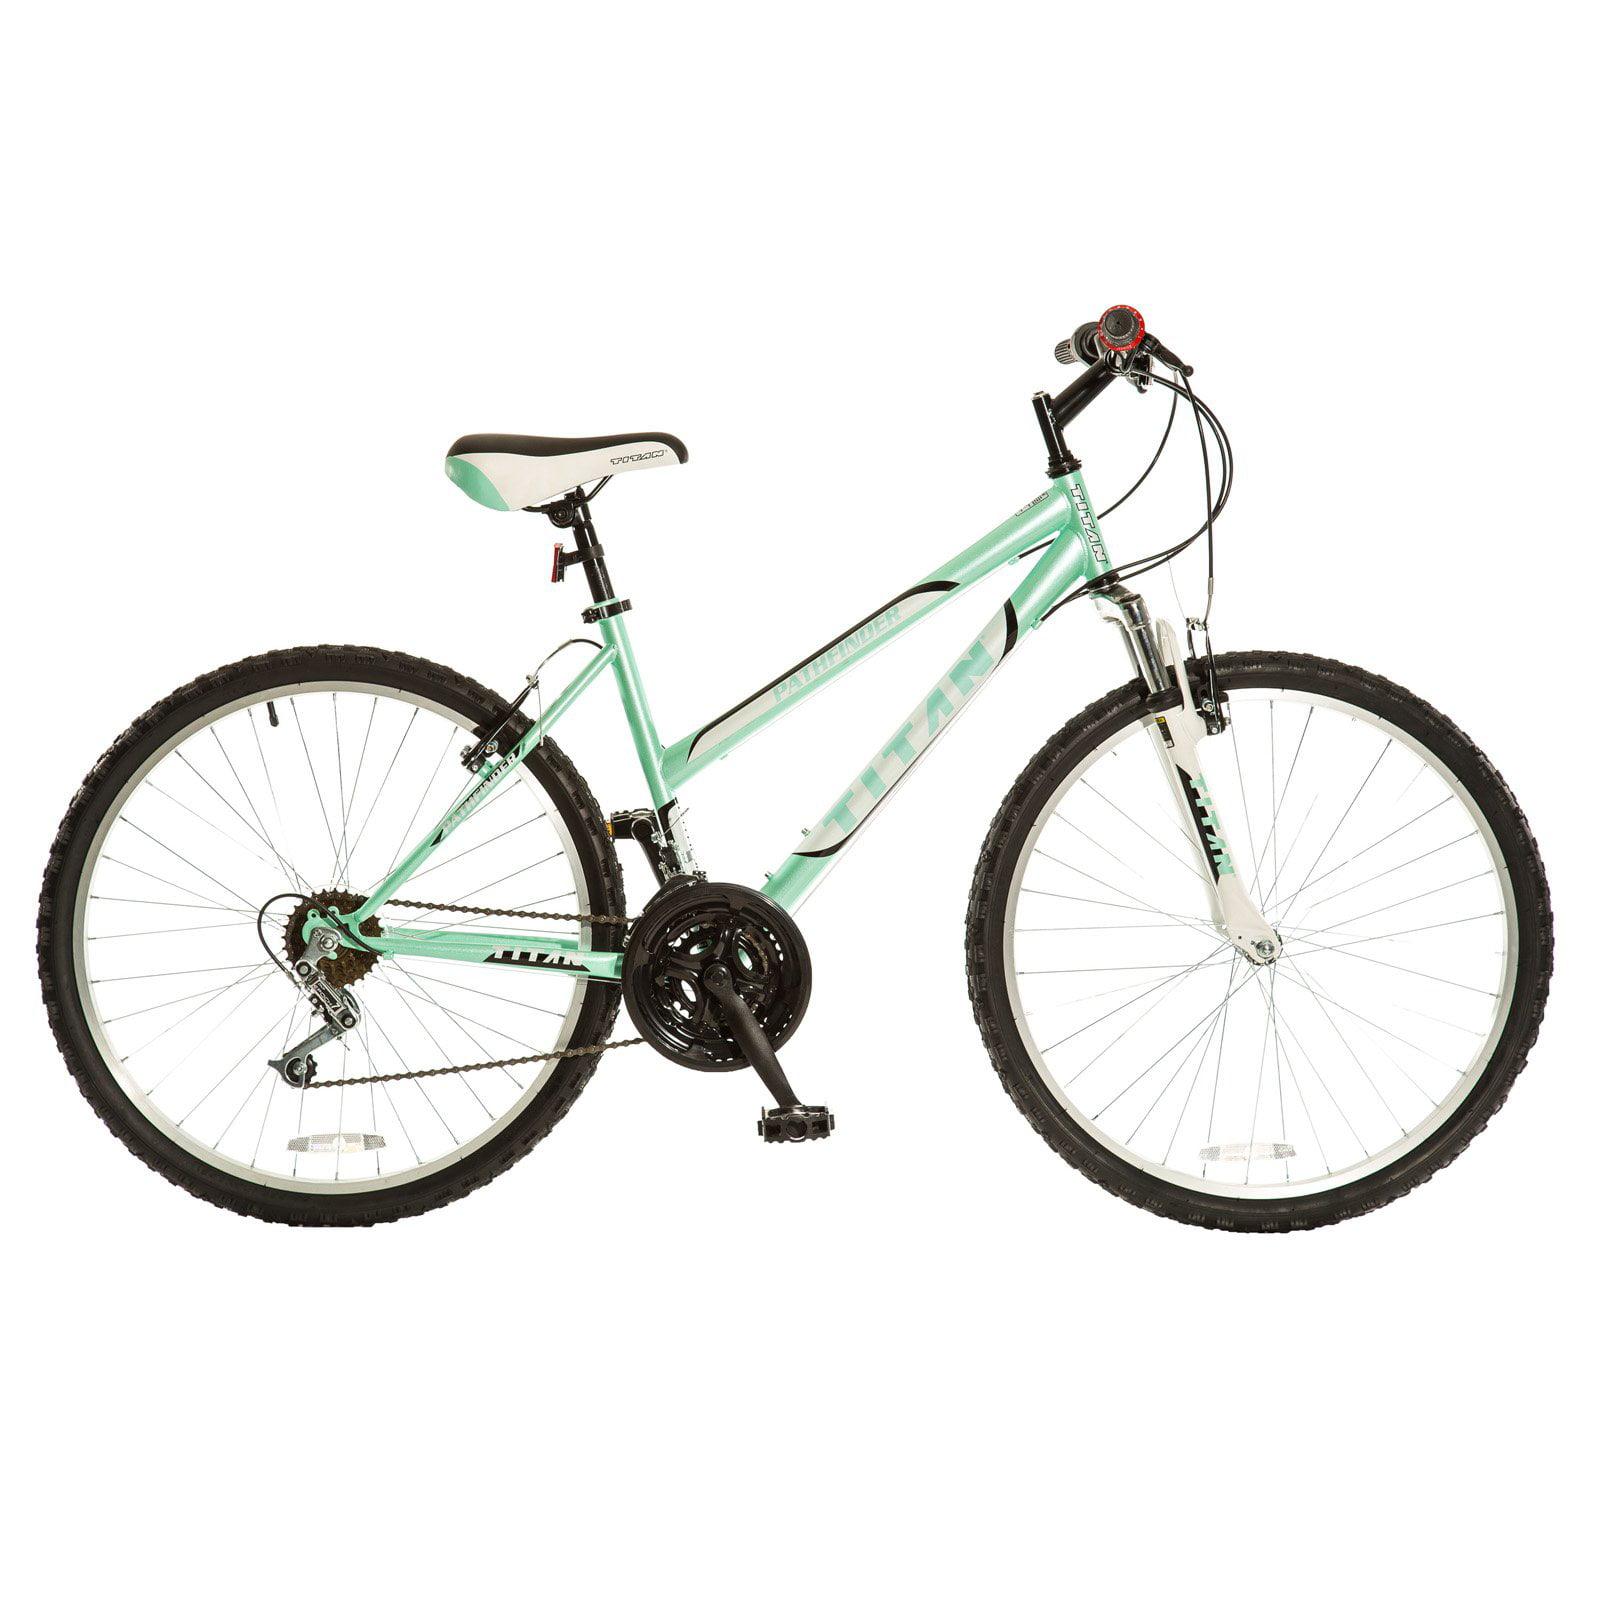 TITAN Pathfinder 18-Speed Women's Suspension Mountain Bike, Mint Green